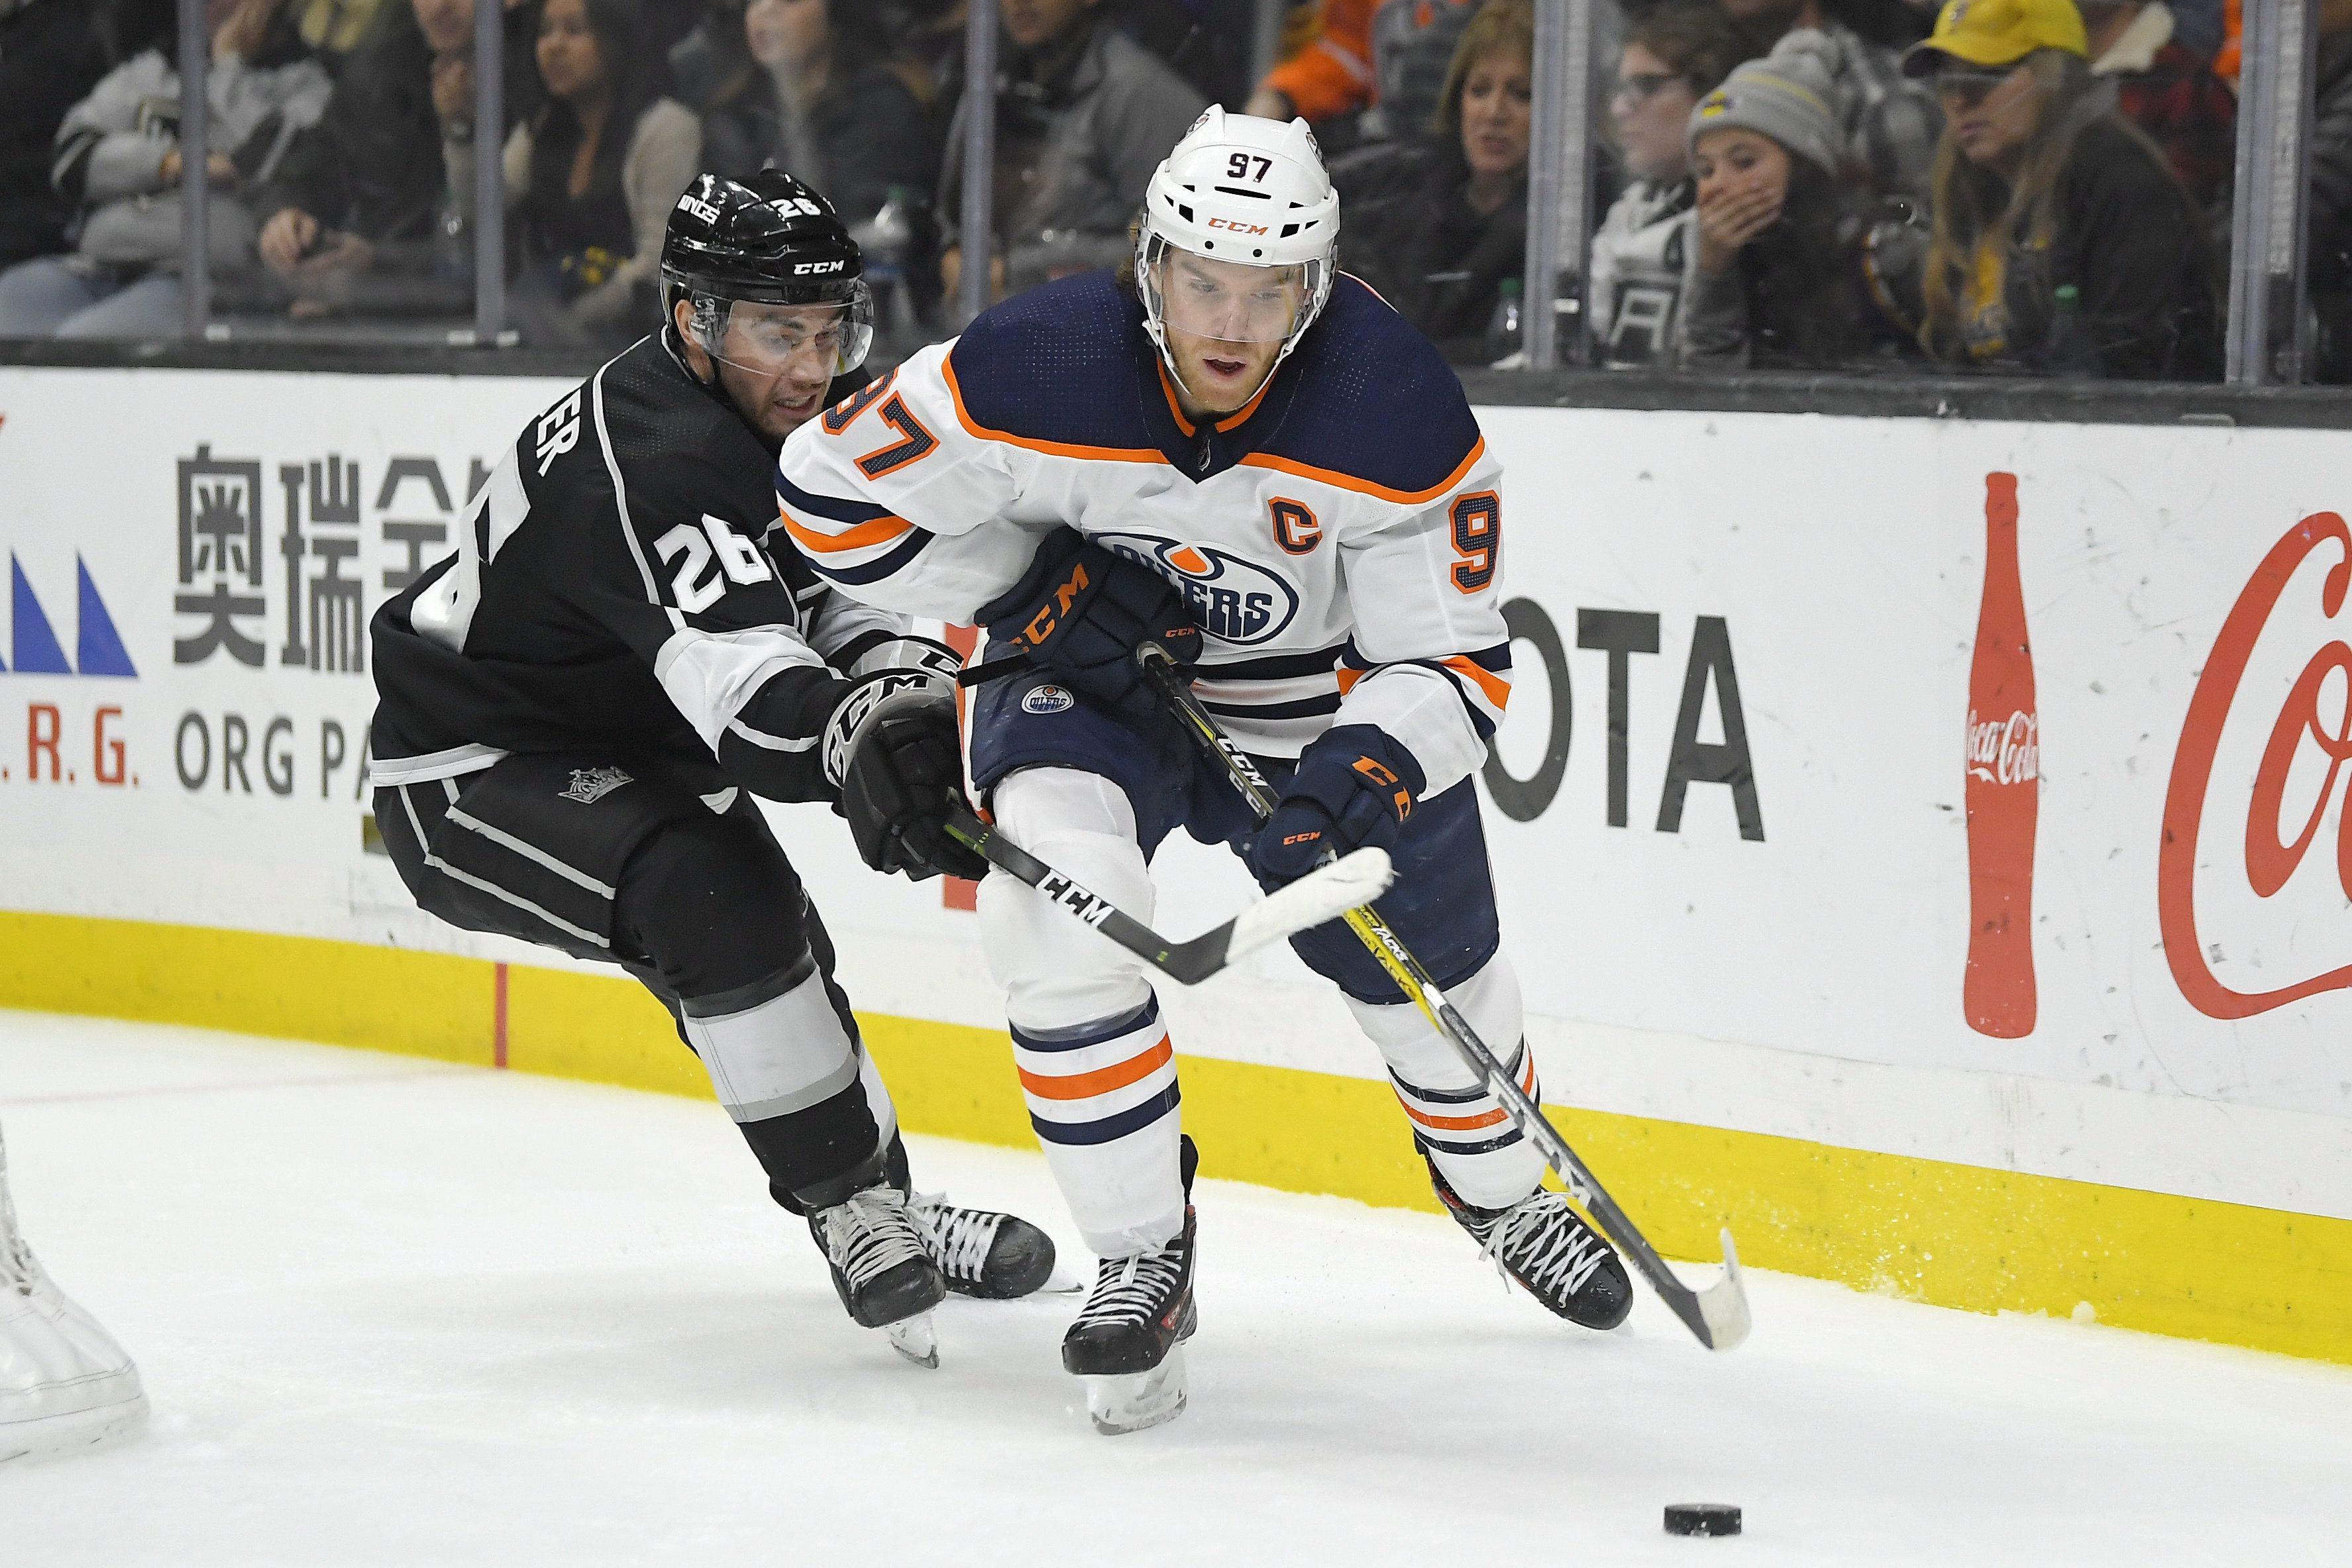 Edmonton Oilers Captain Connor McDavid Speaks Out About Ending Racism